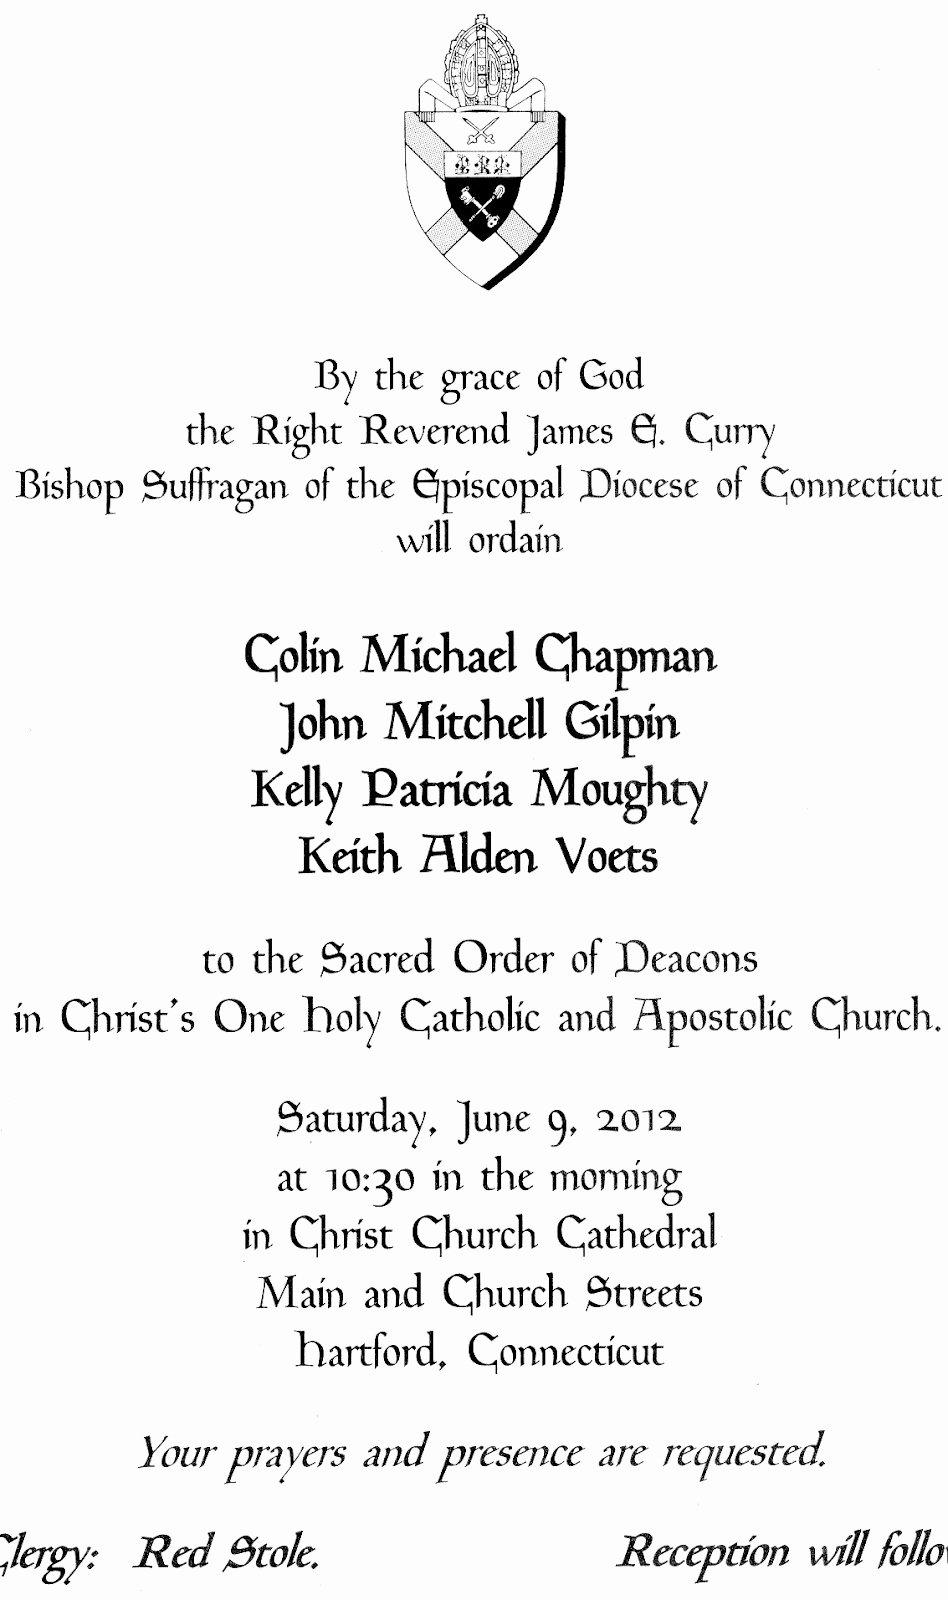 Free ordination Certificate Download Beautiful Free Deacon ordination Invitations Templates